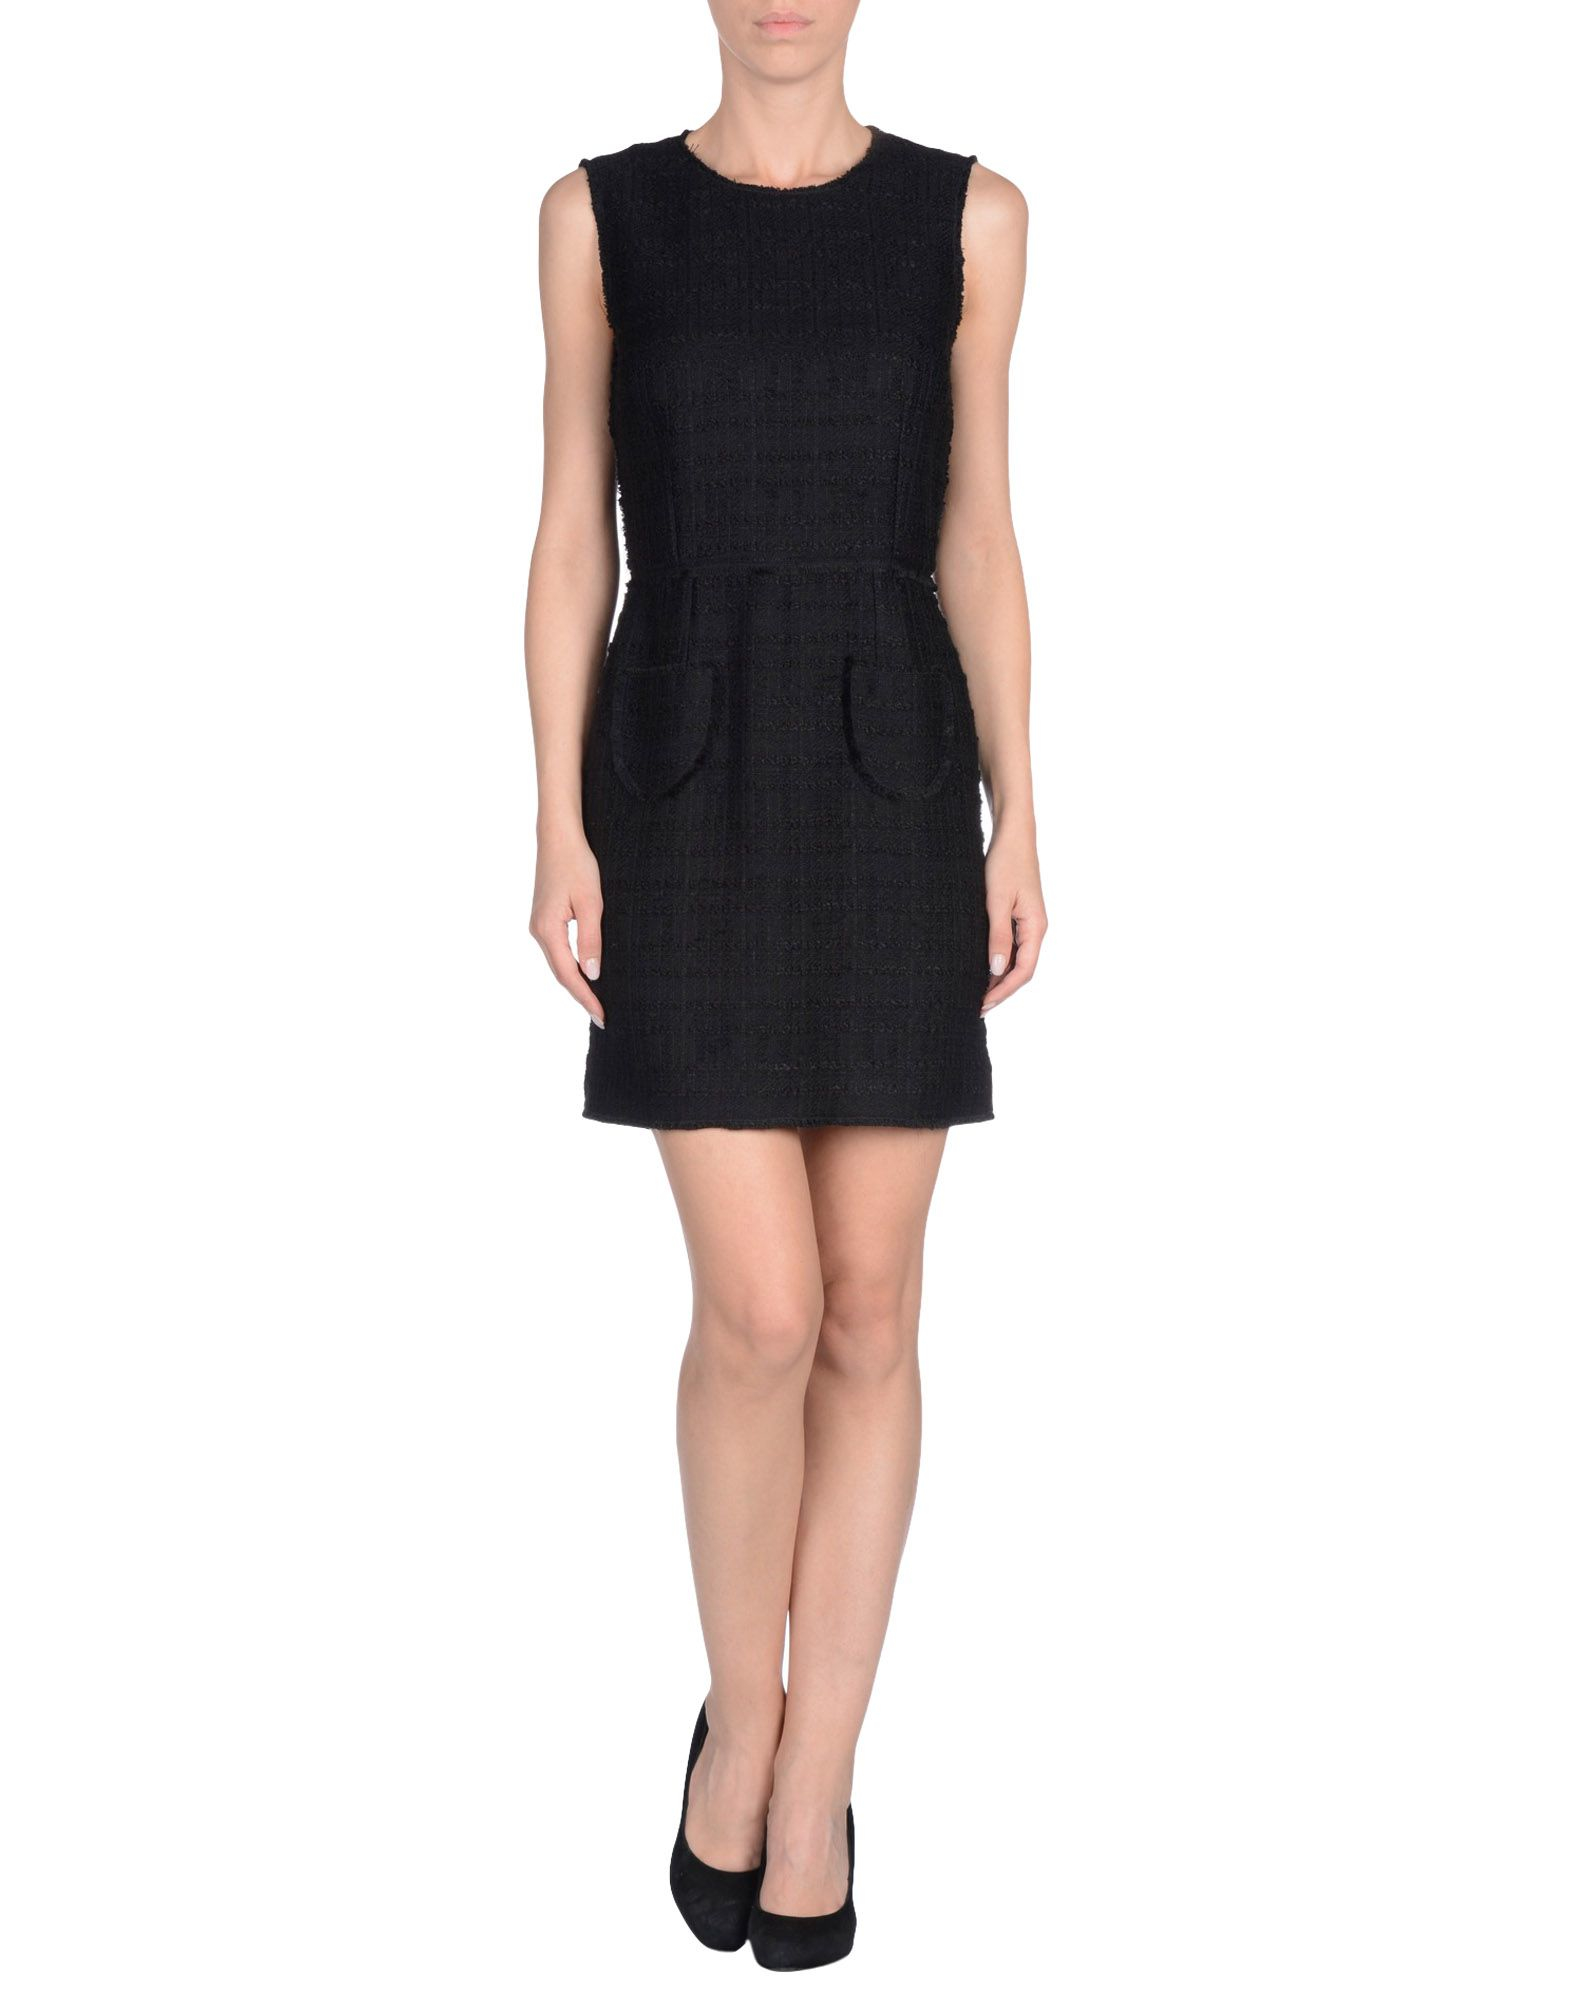 00667b18ba0 Lyst - Dolce   Gabbana Short Dress in Black